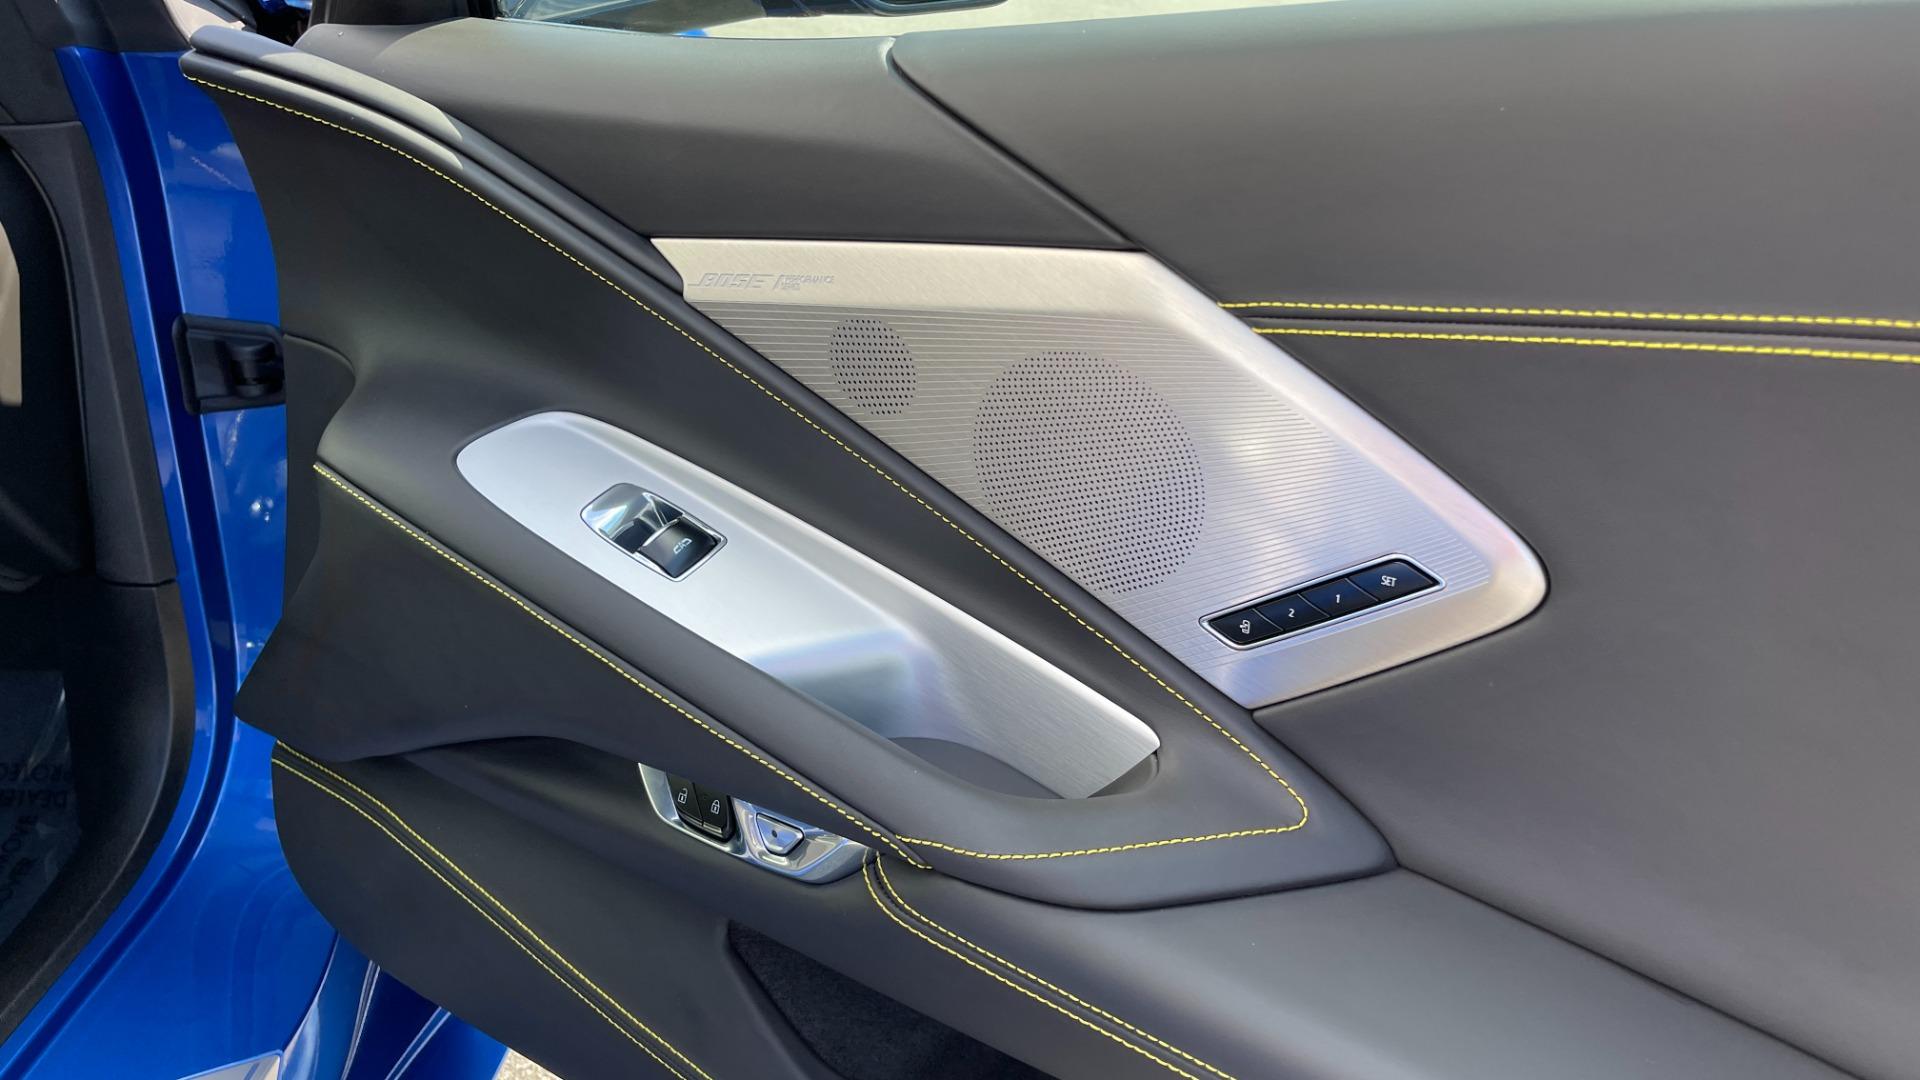 Used 2021 Chevrolet CORVETTE STINGRAY 3LT COUPE / 8-SPD / PERF PKG / NAV / BOSE / REARVIEW for sale $110,995 at Formula Imports in Charlotte NC 28227 41